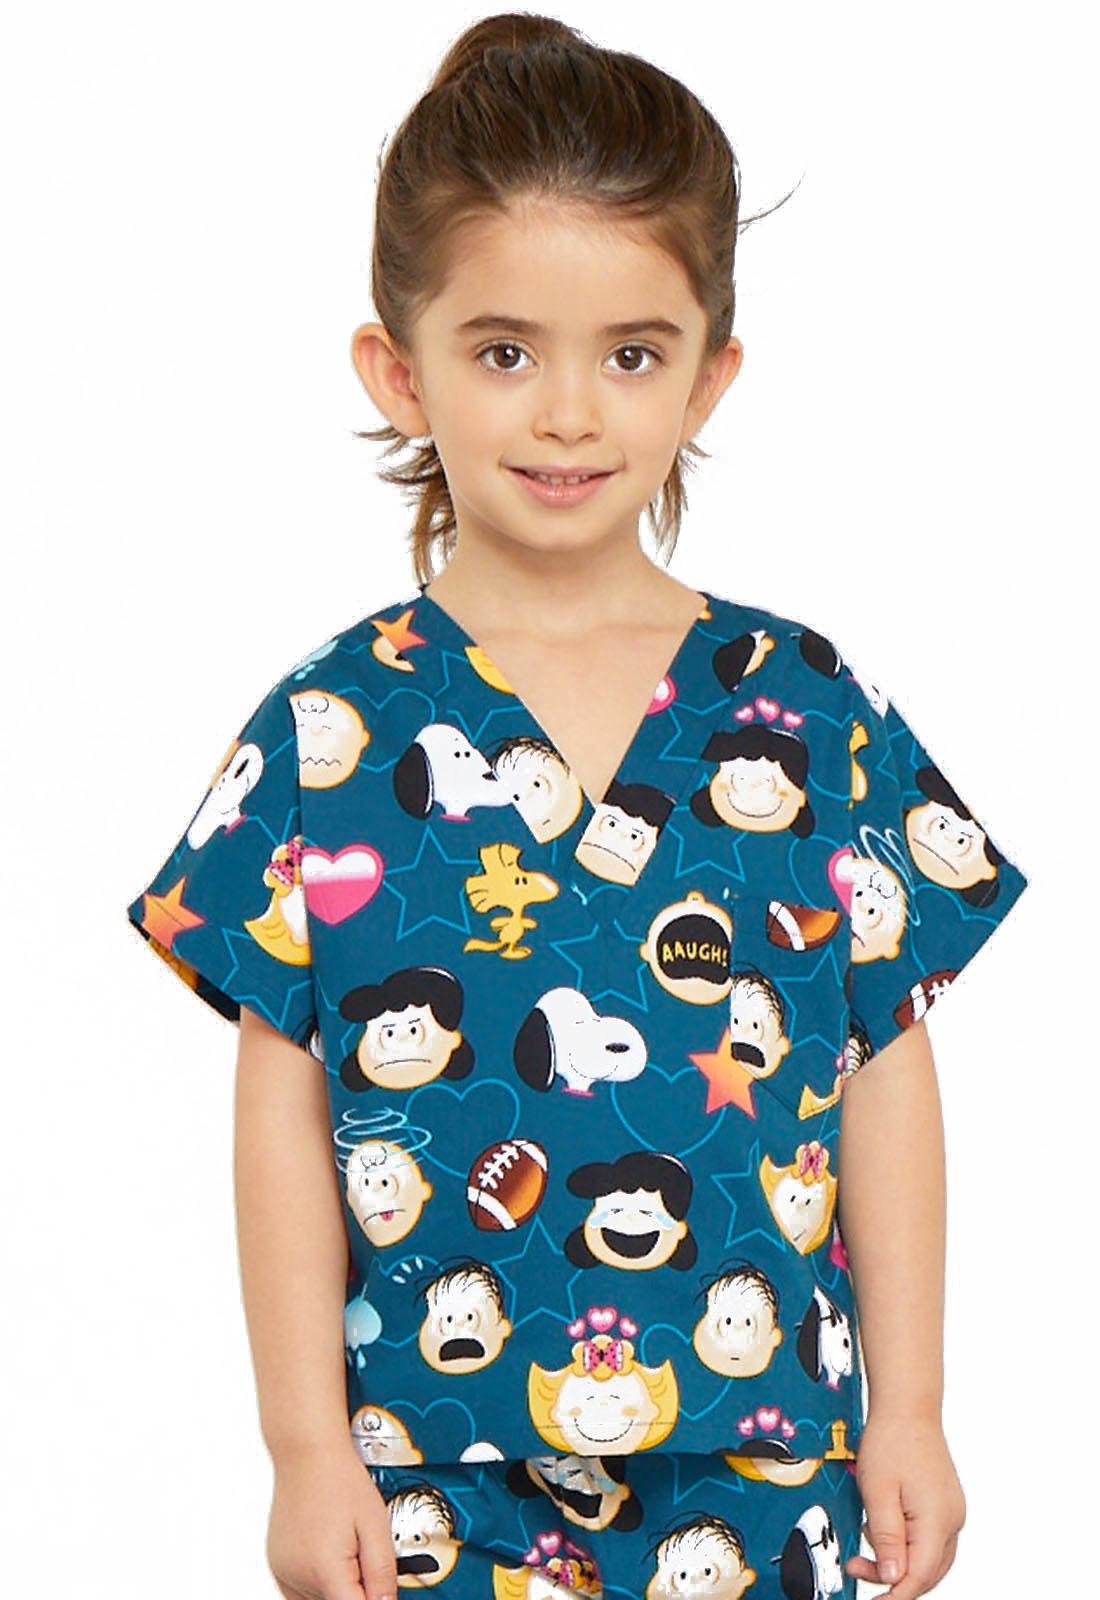 95257773bf6 Licensed Prints Child's Unisex Kids Top and Pant Scrub Set Peanuts Emoji